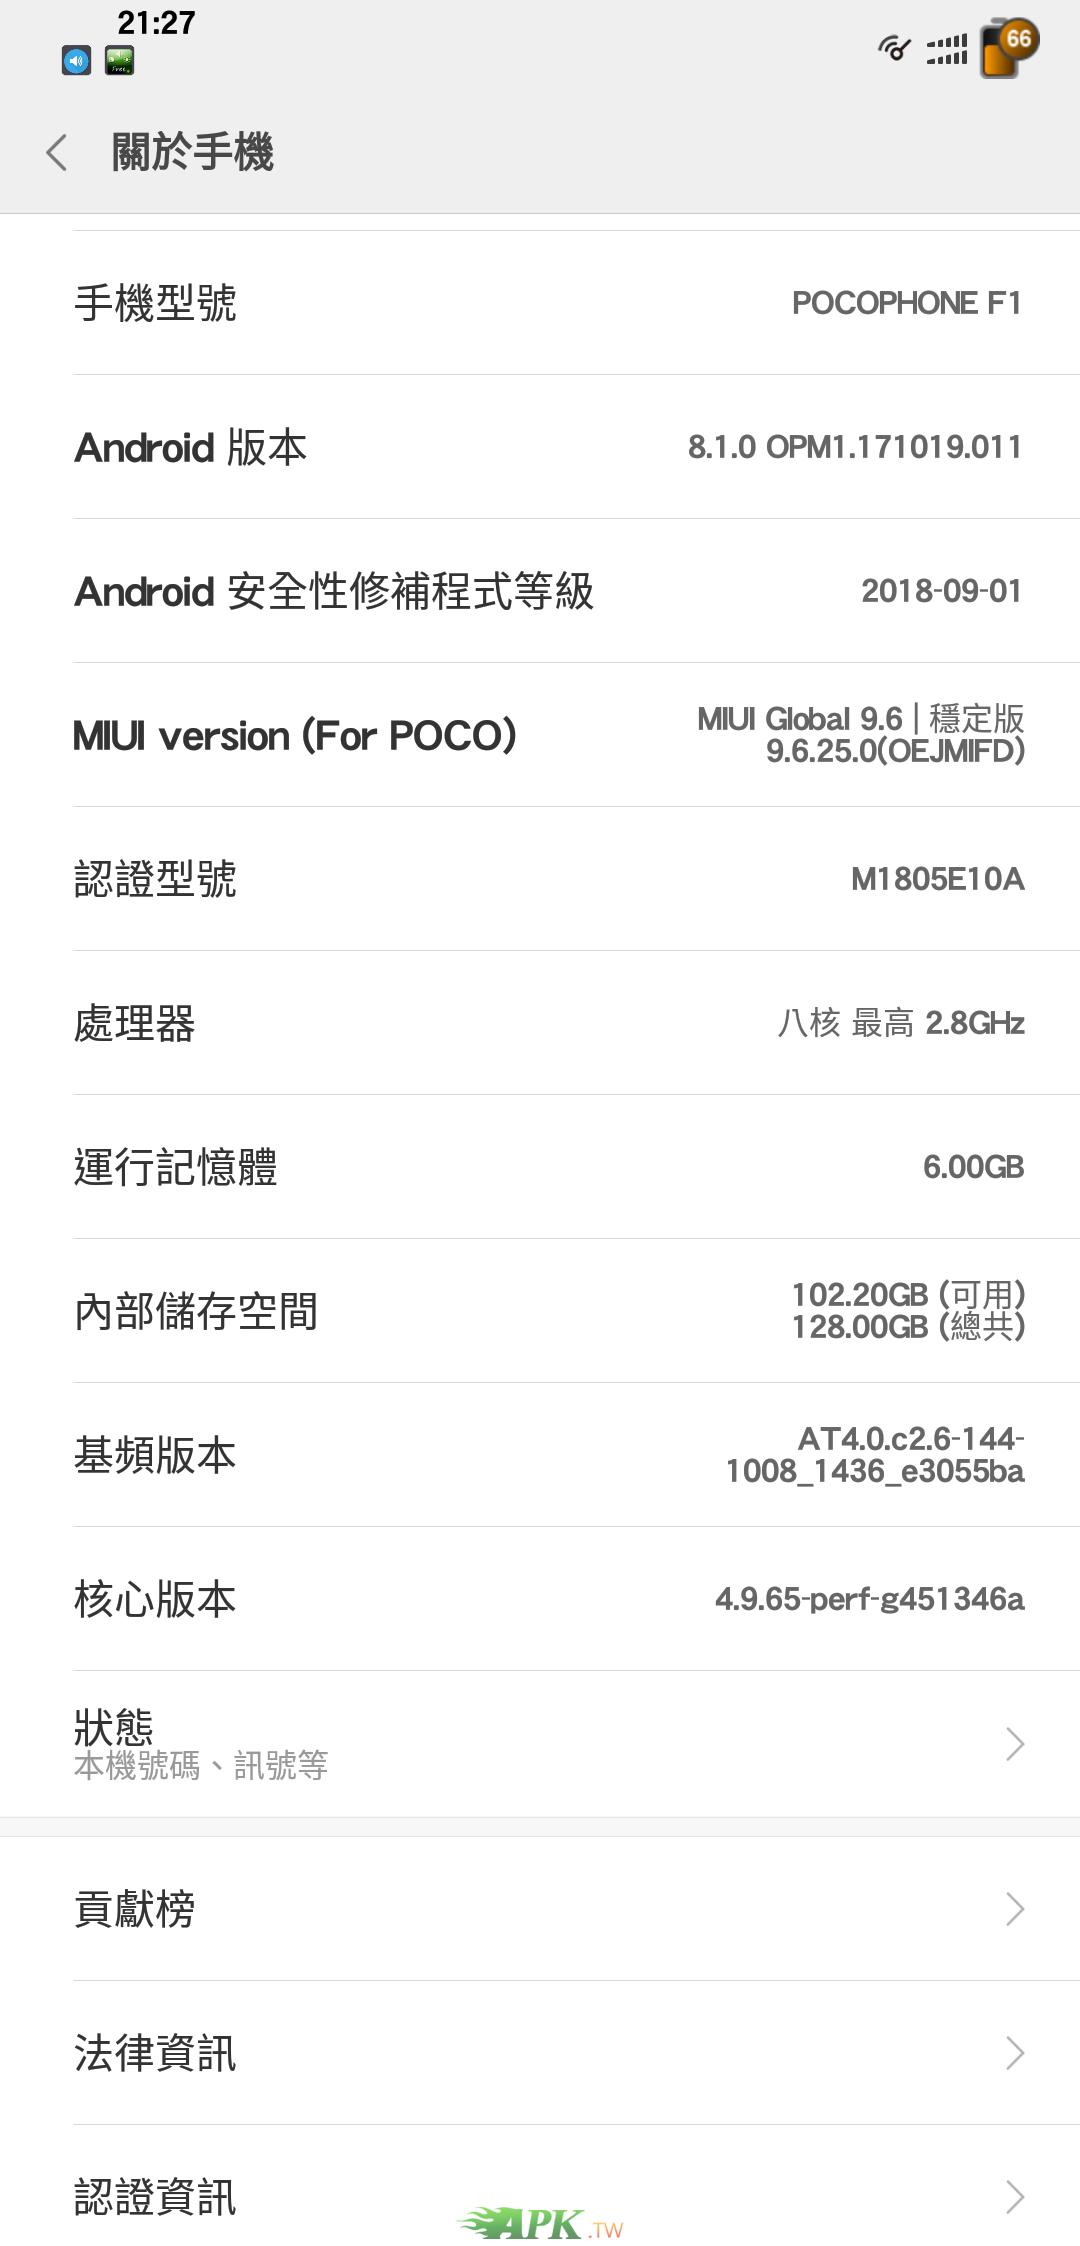 Screenshot_2019-01-08-21-27-30-801_com.android.settings.png